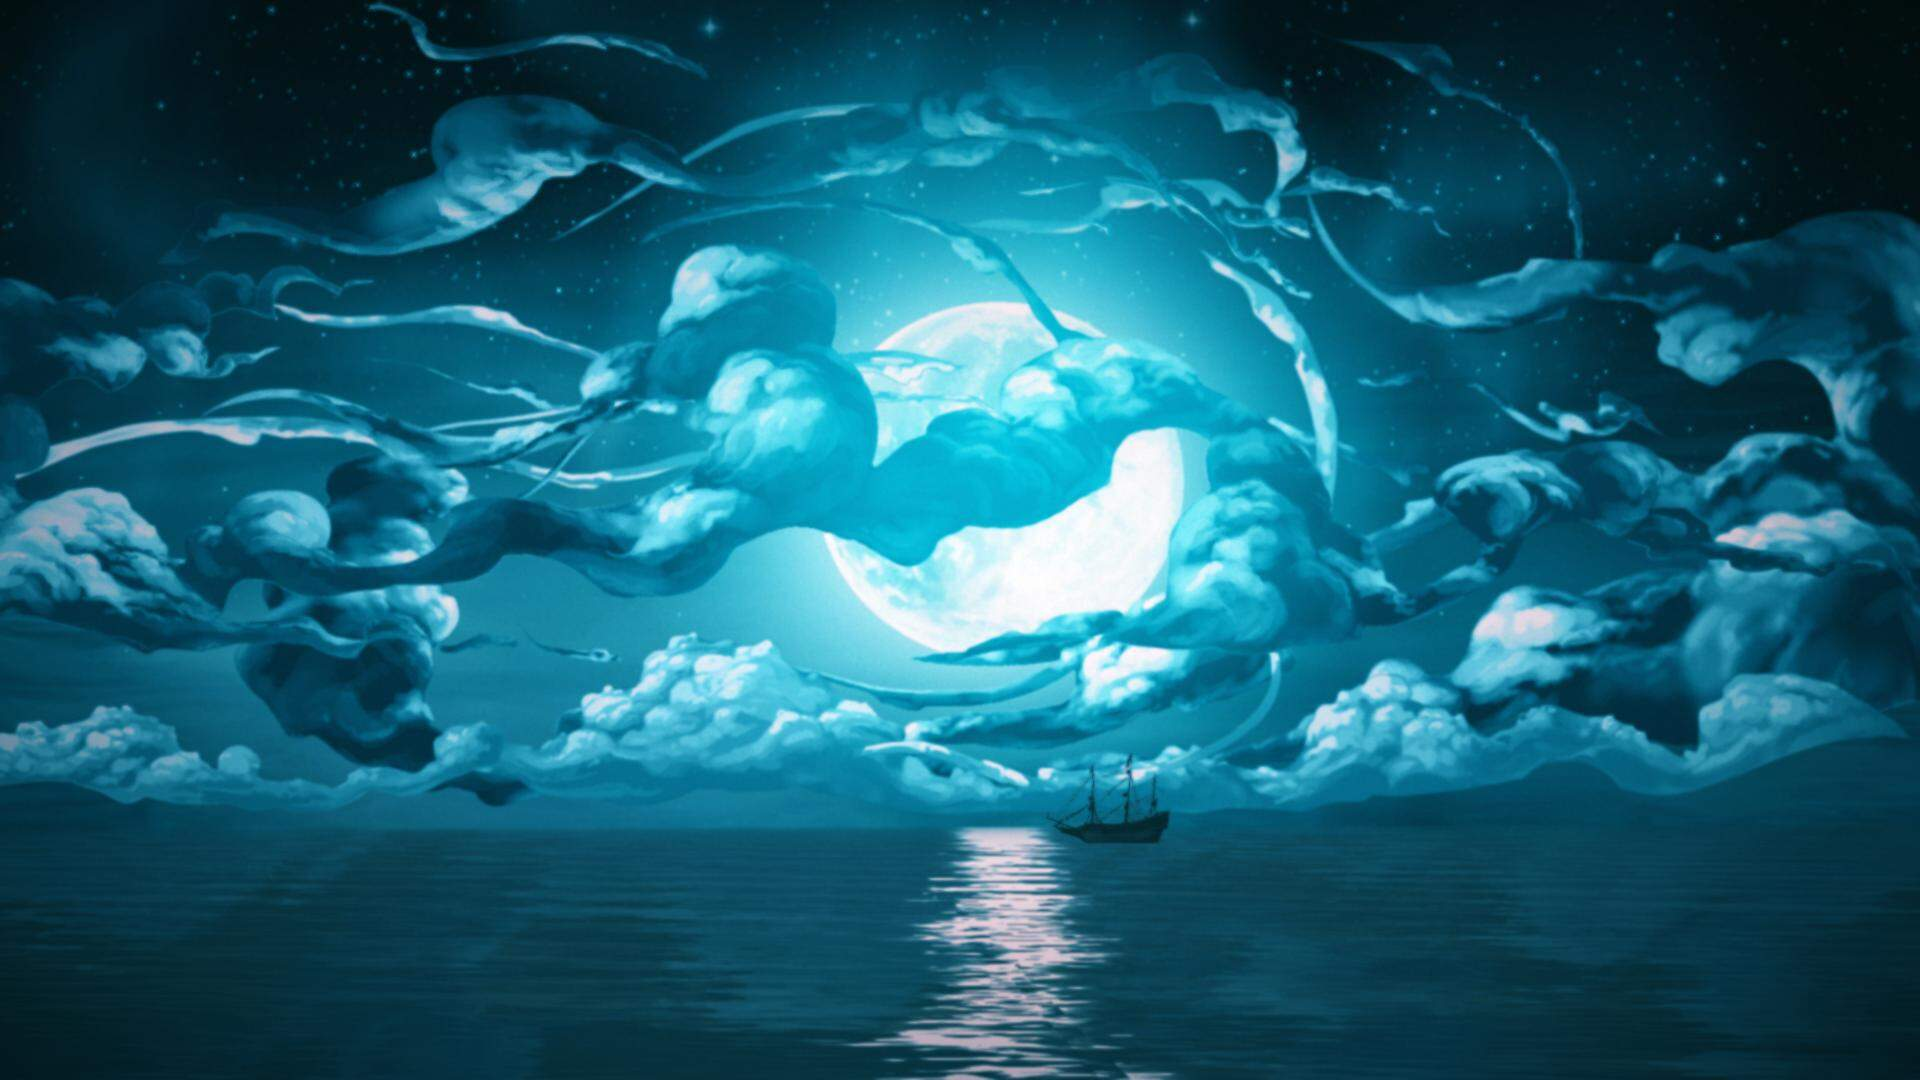 Silence Ozean bei Nacht